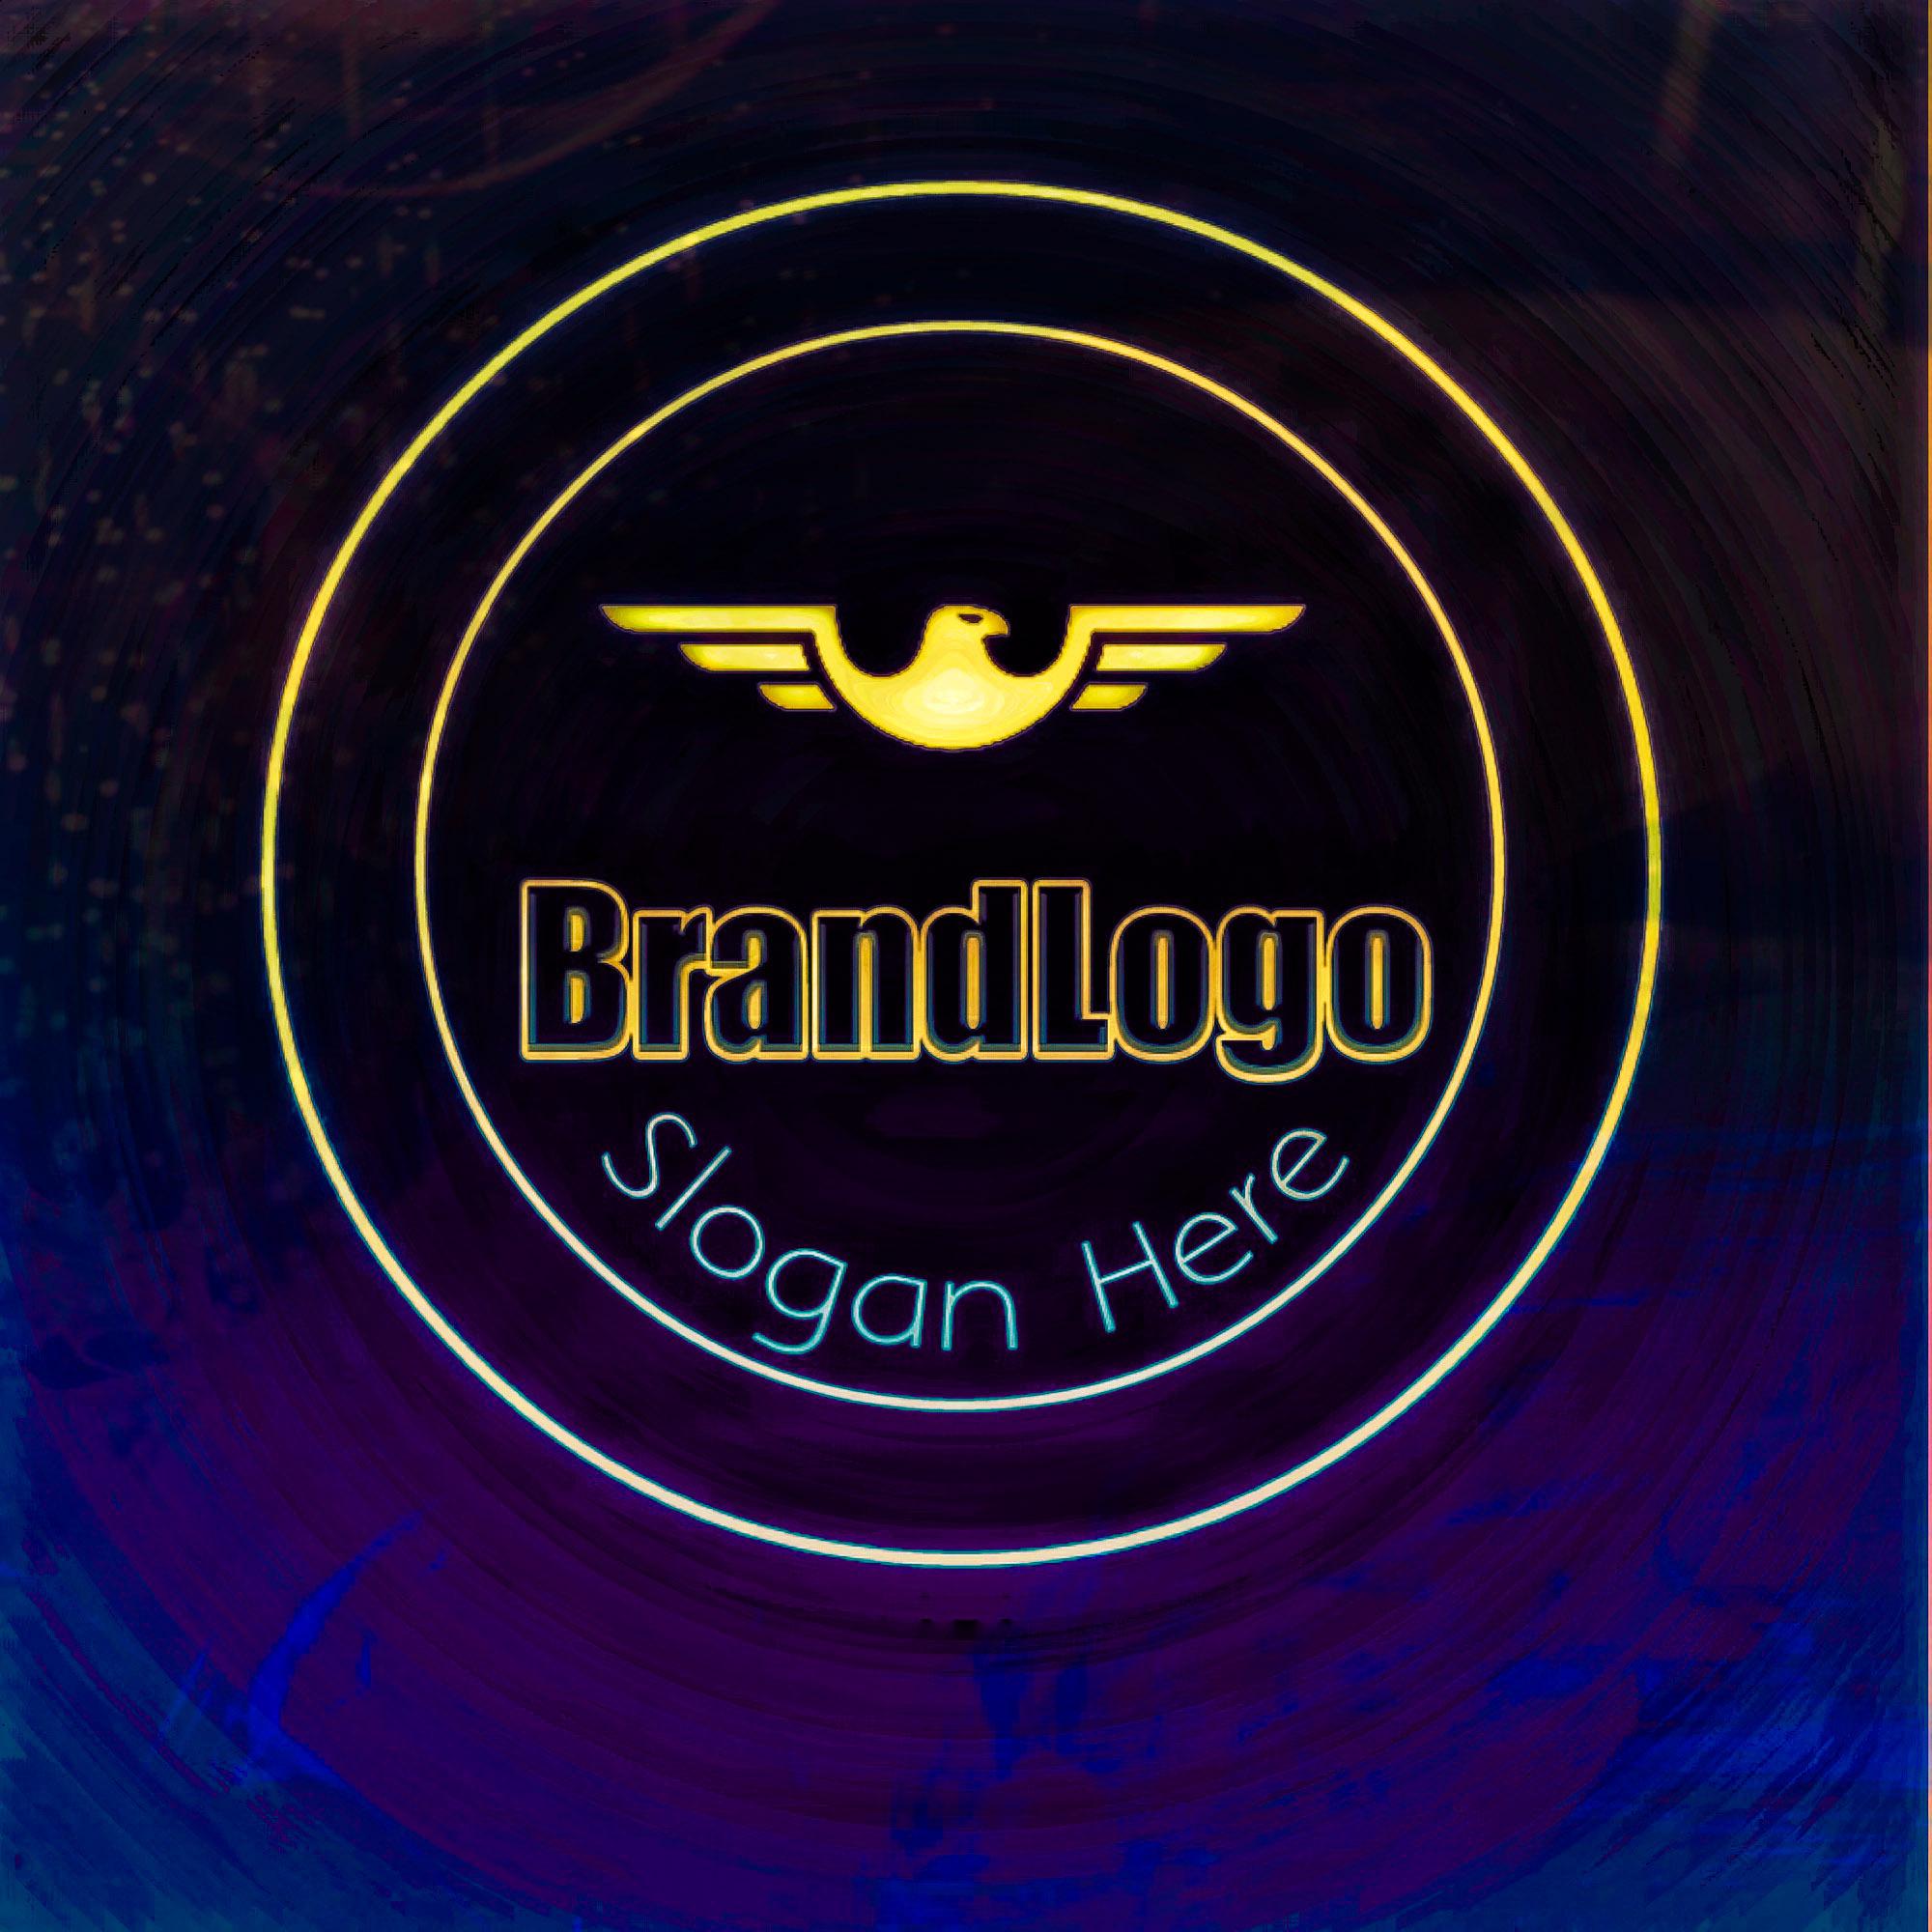 I will make a awesome logo design